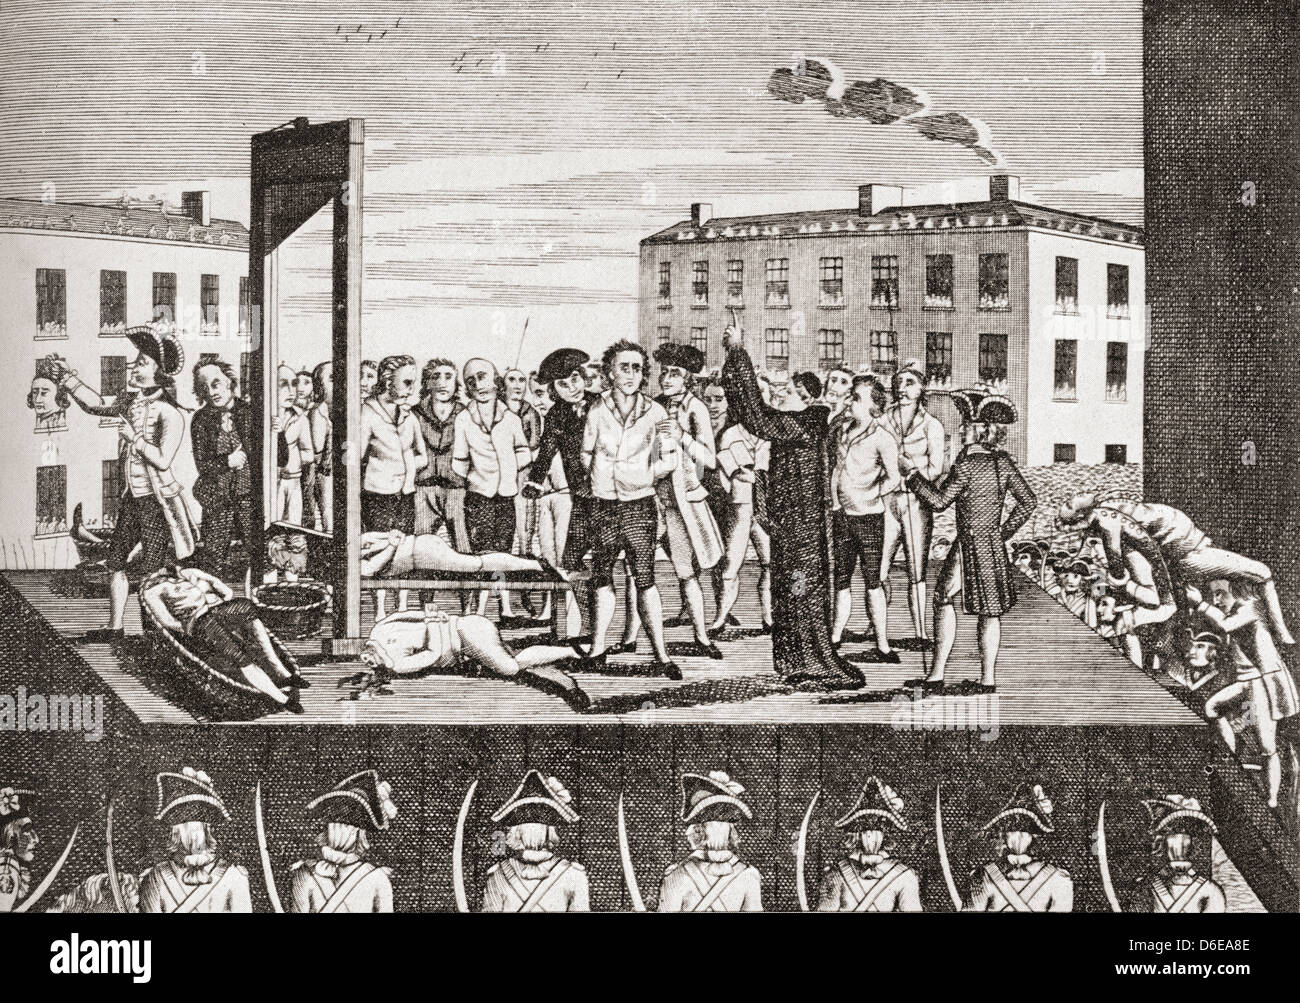 L'esecuzione di Jacques Pierre Brissot, 1754 - 1793, aka de Warville. Immagini Stock